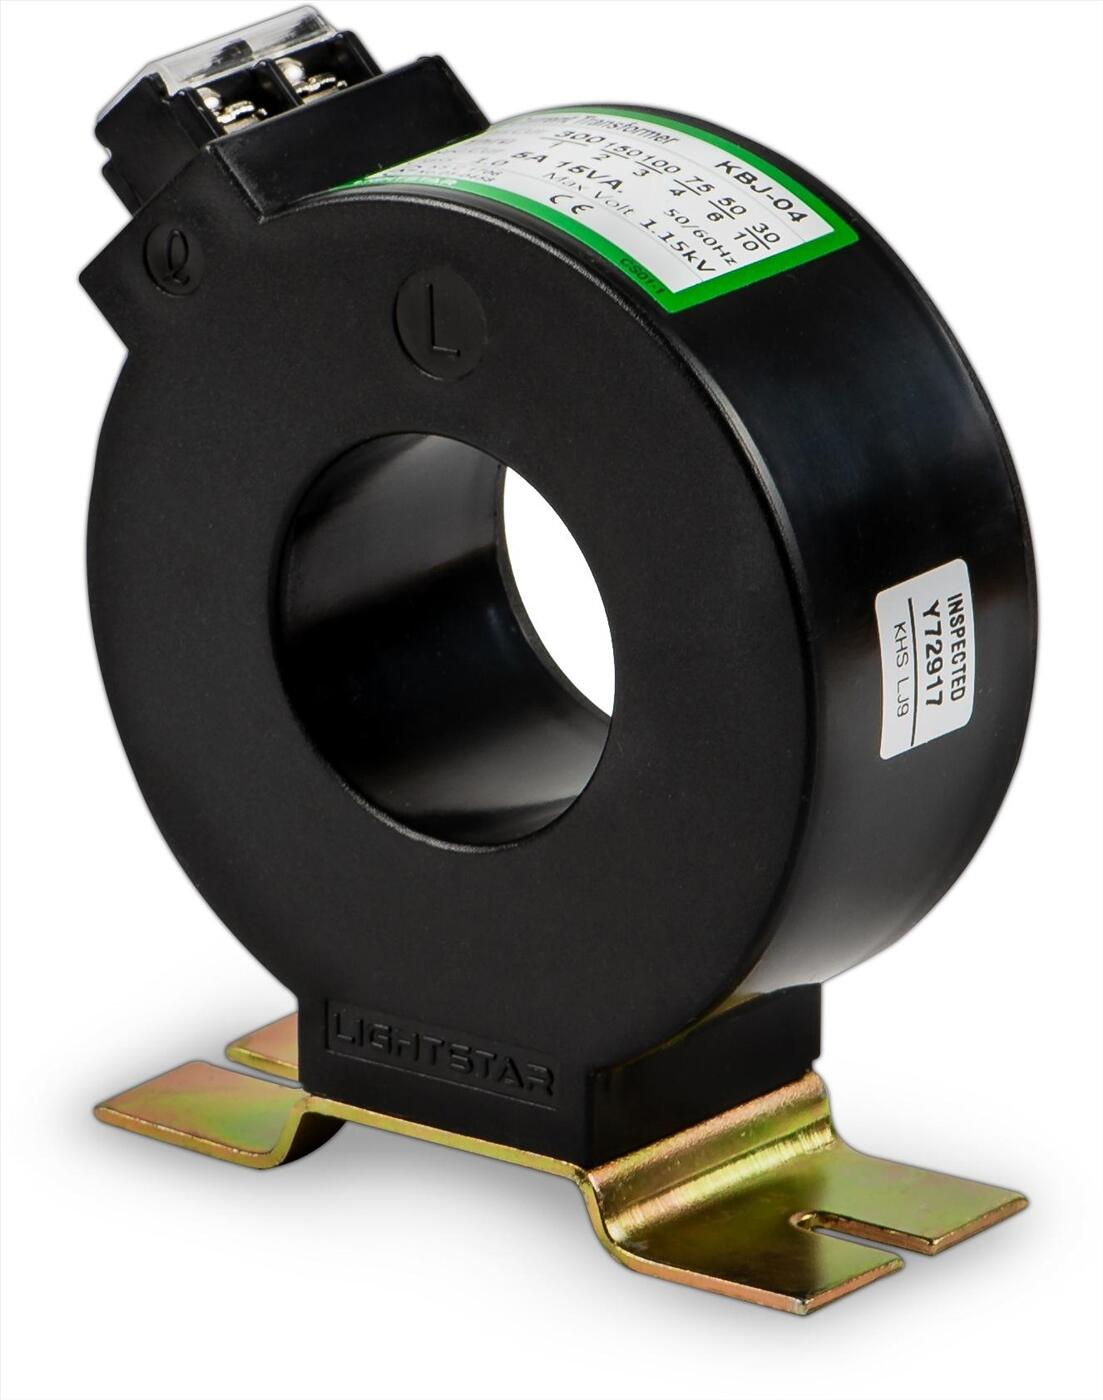 Biến dòng đo lường KBJ-04 (150/5A,200/5A,250/5A,300/5A,400/5A,450/5A)